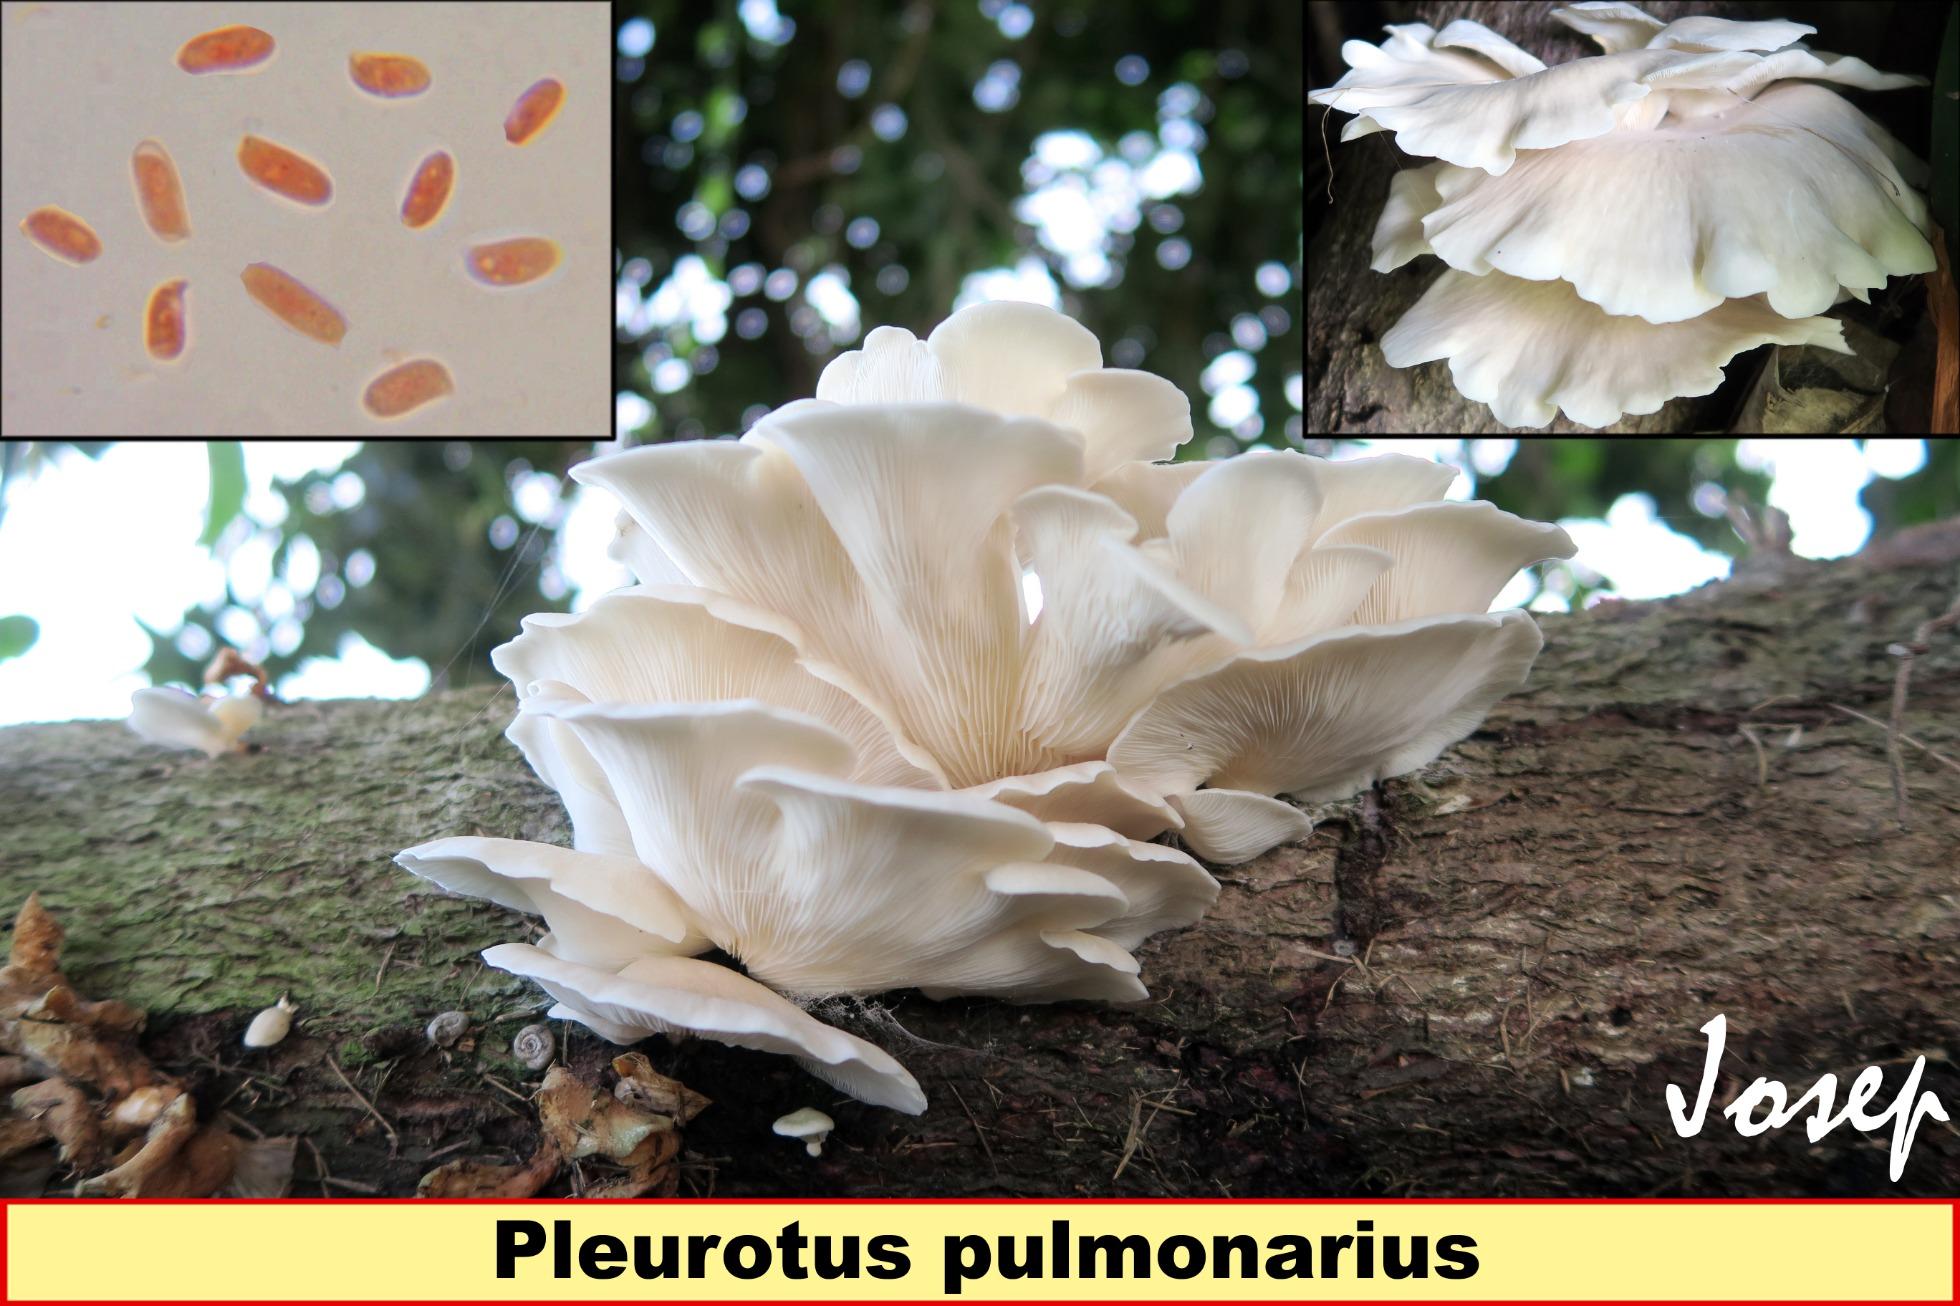 Pleurotuspulmonarius_2019-08-08.jpg